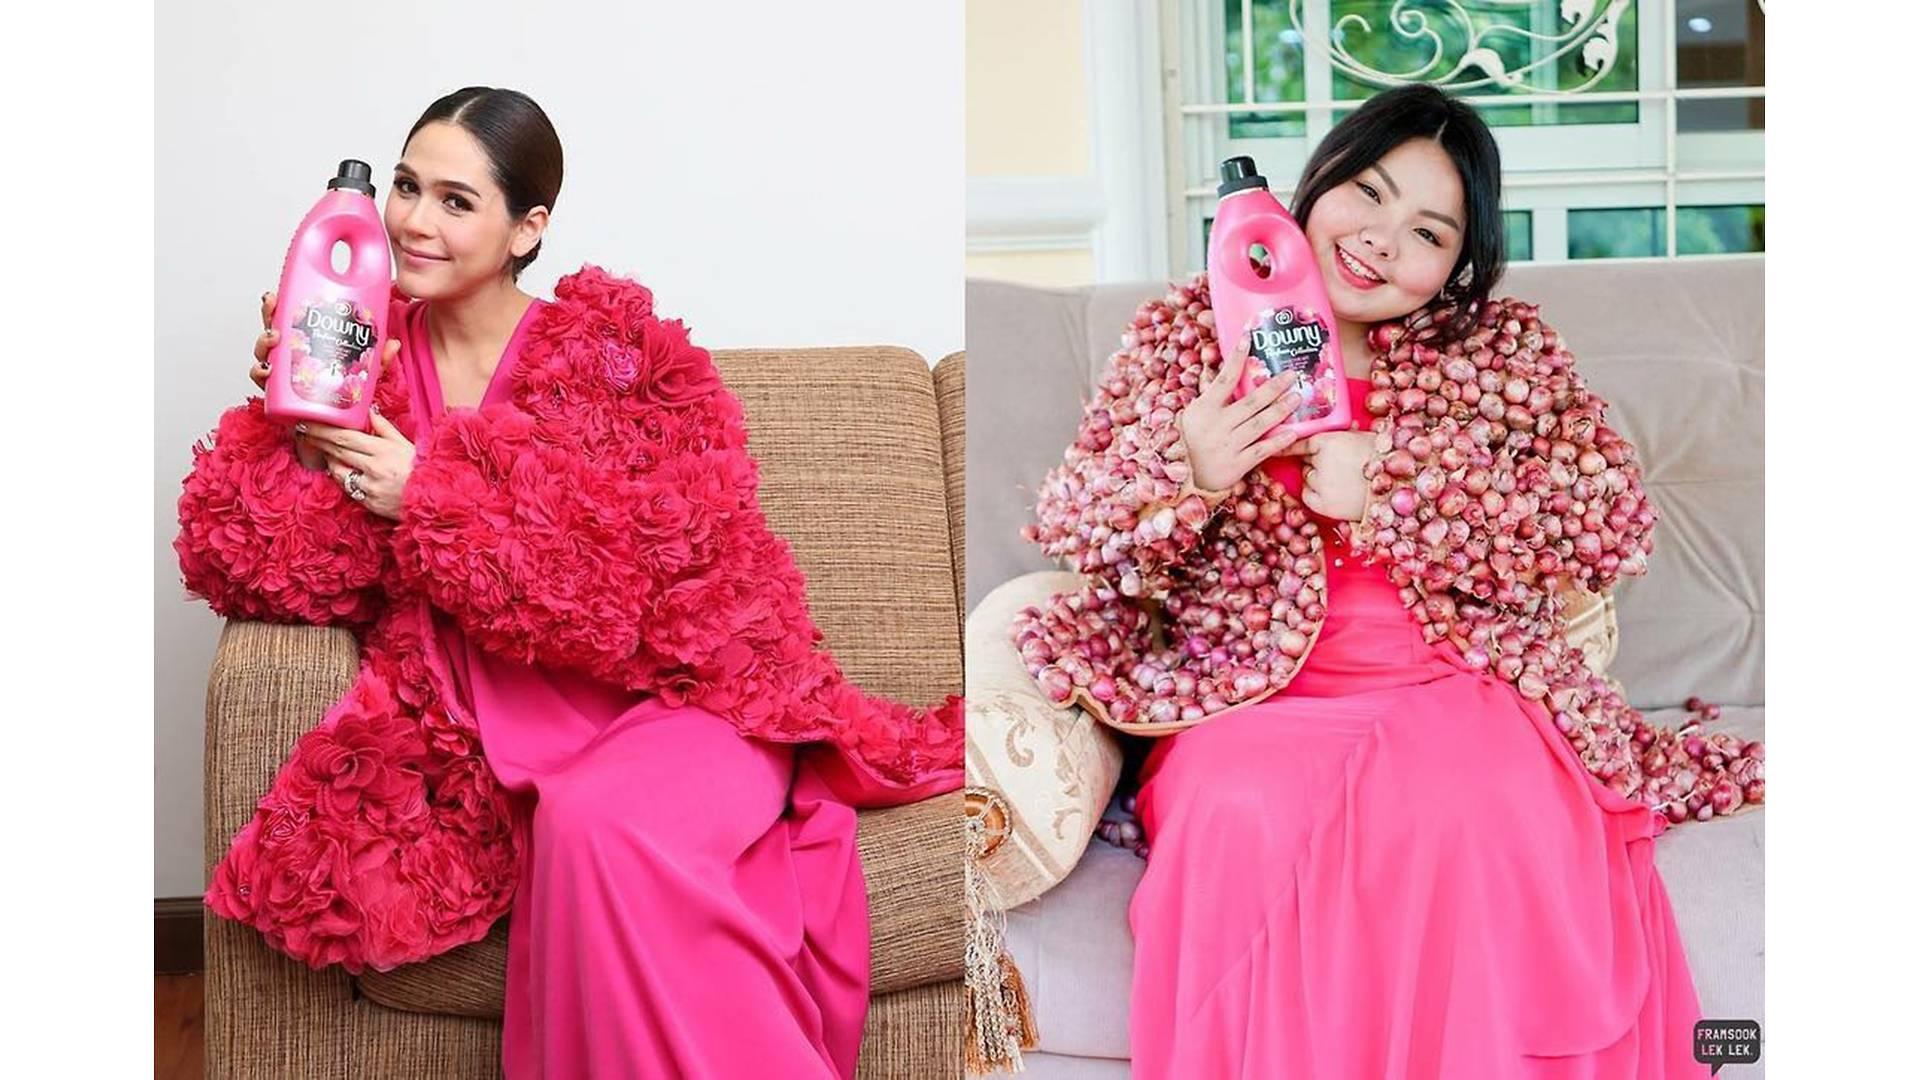 Thai Model Sine Benjaphorn Brilliantly Recreates Celebrity Styles Using Food (49 Pics)